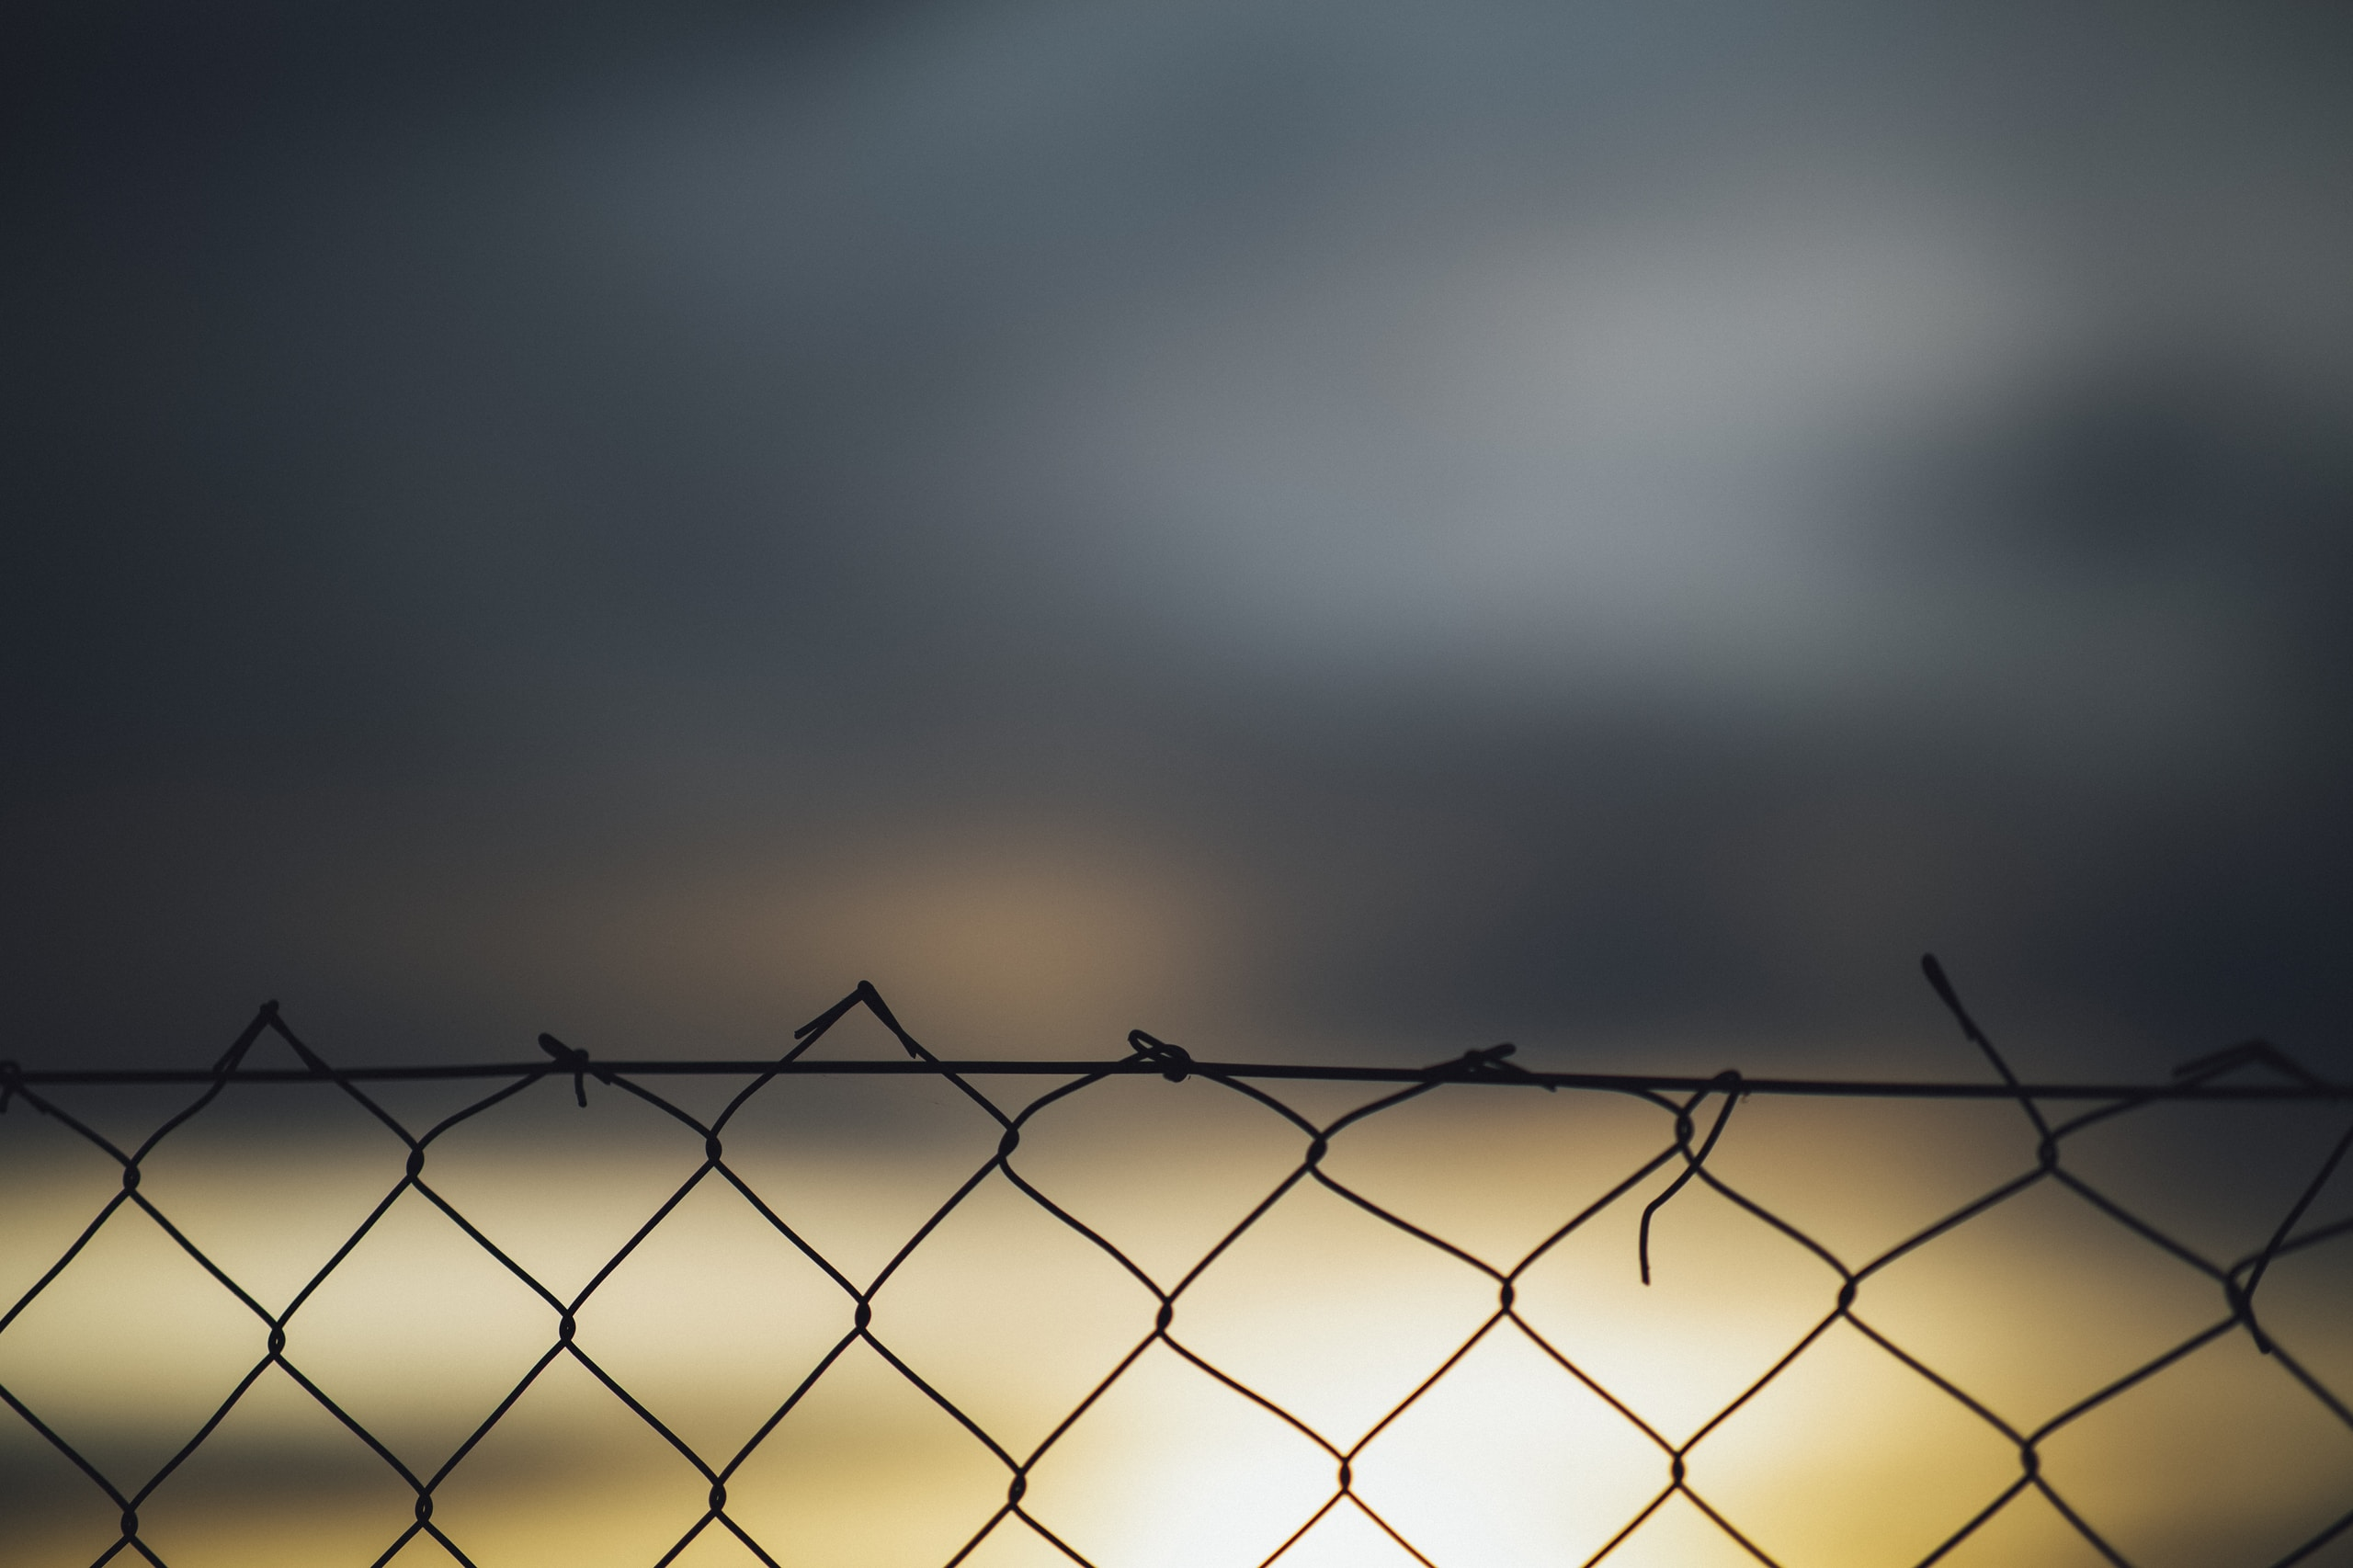 Fence at sundown